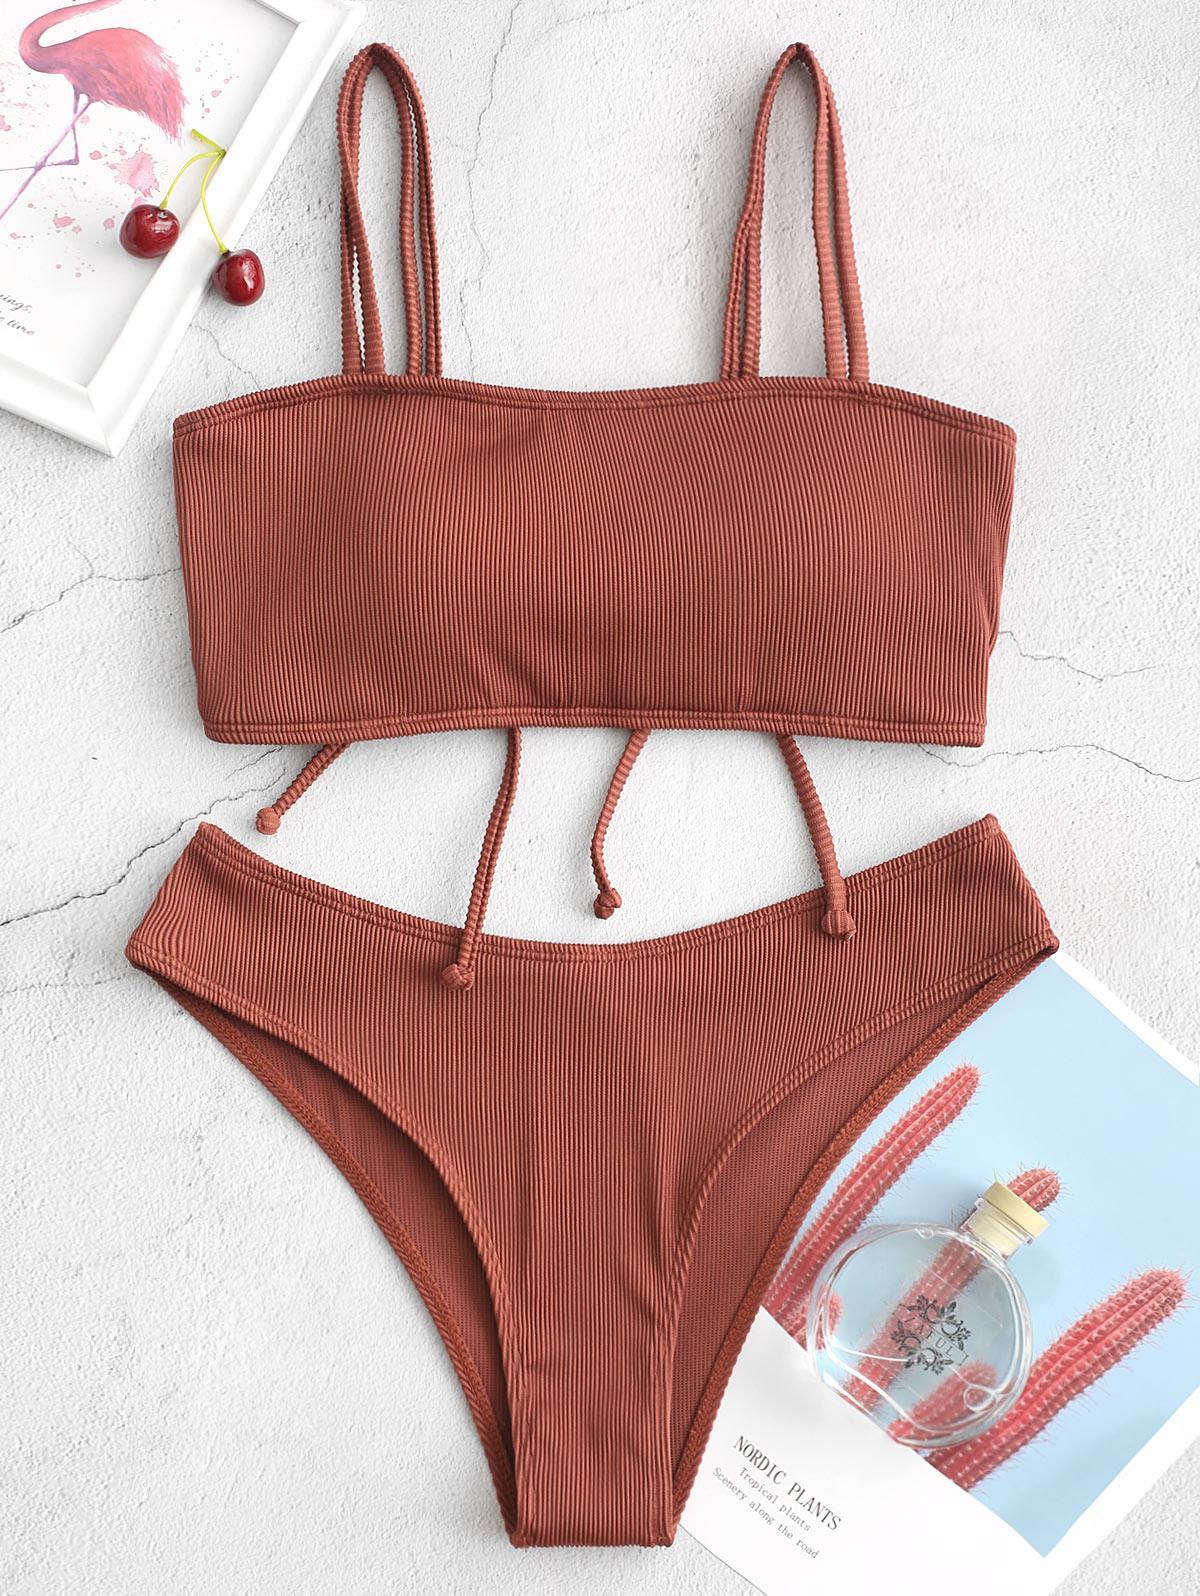 ZAFUL Cinched Textured Ribbed Bikini Swimsuit фото